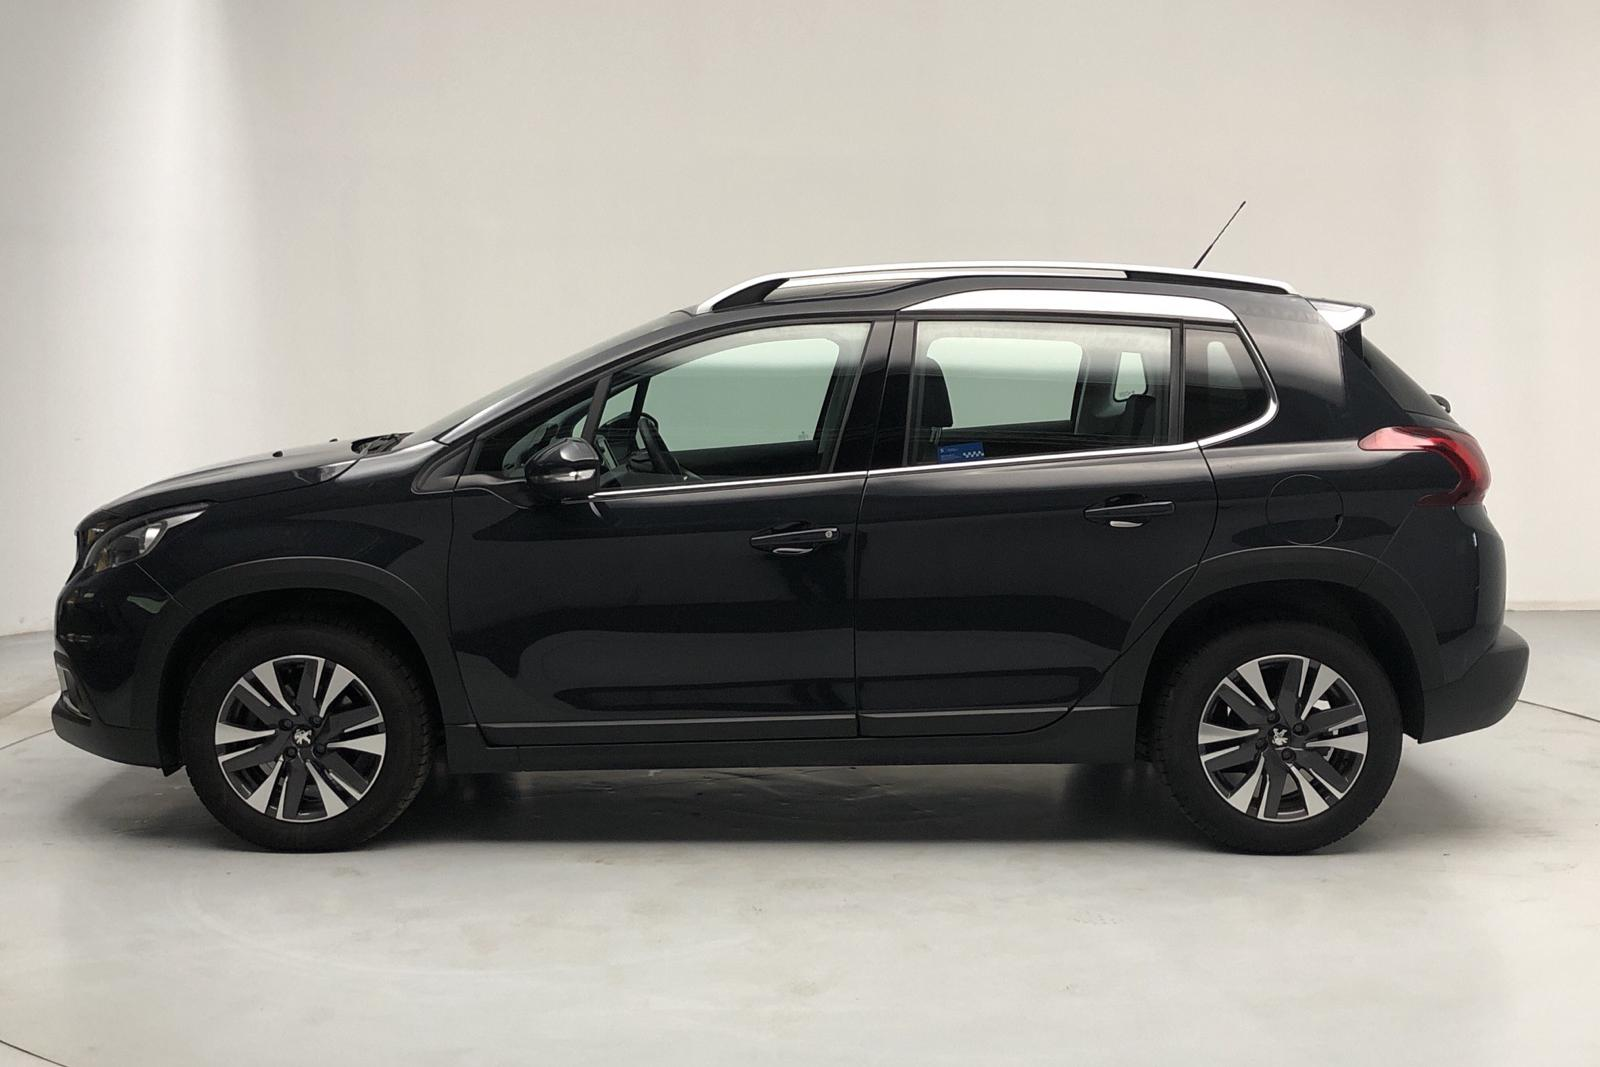 Peugeot 2008 PureTech (110hk) - 7 500 km - Unknown - 2019